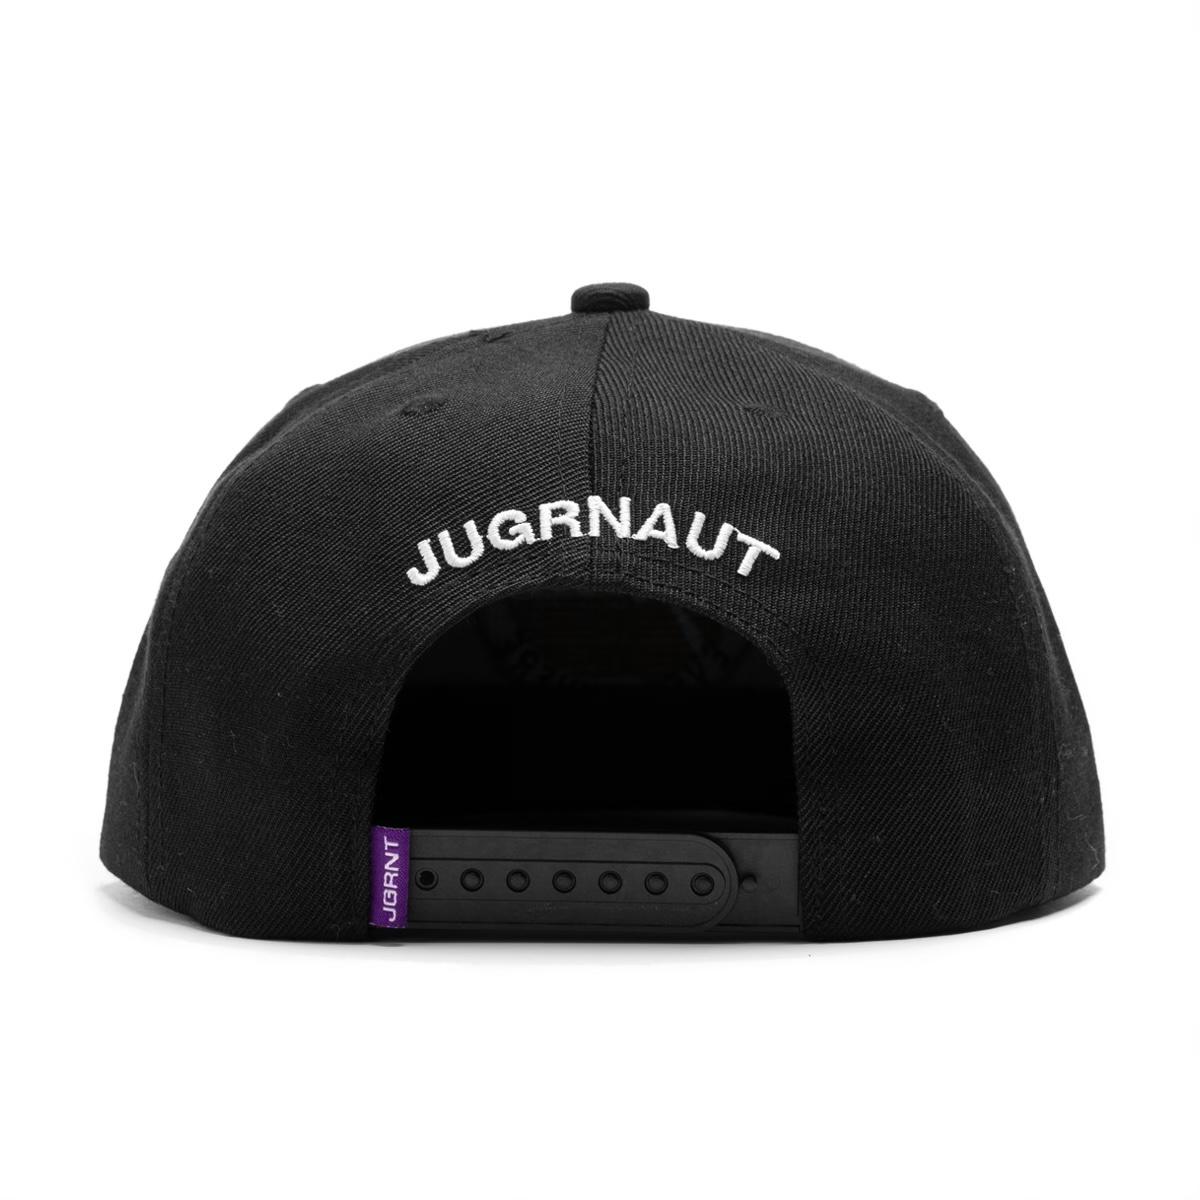 Jugrnaut Jugrnaut University Snap Black